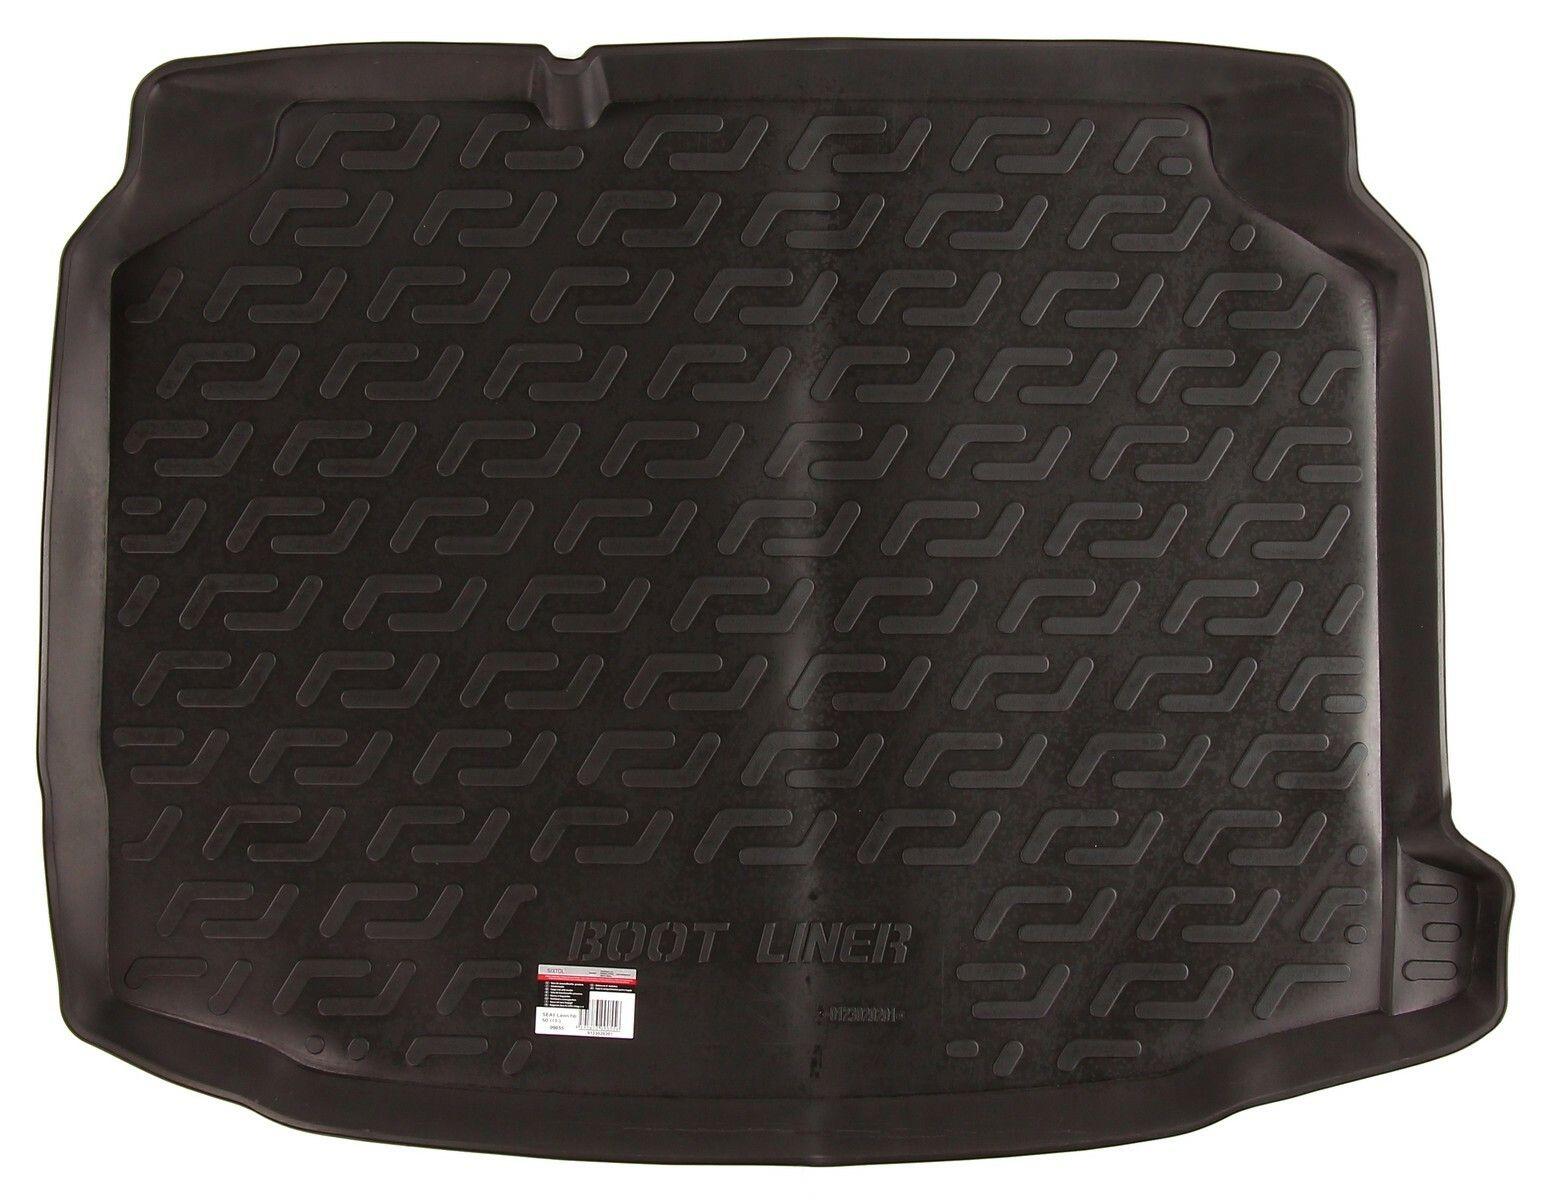 Vana do kufru gumová Seat León III (5F) Hatchback (5-dv) (12-)